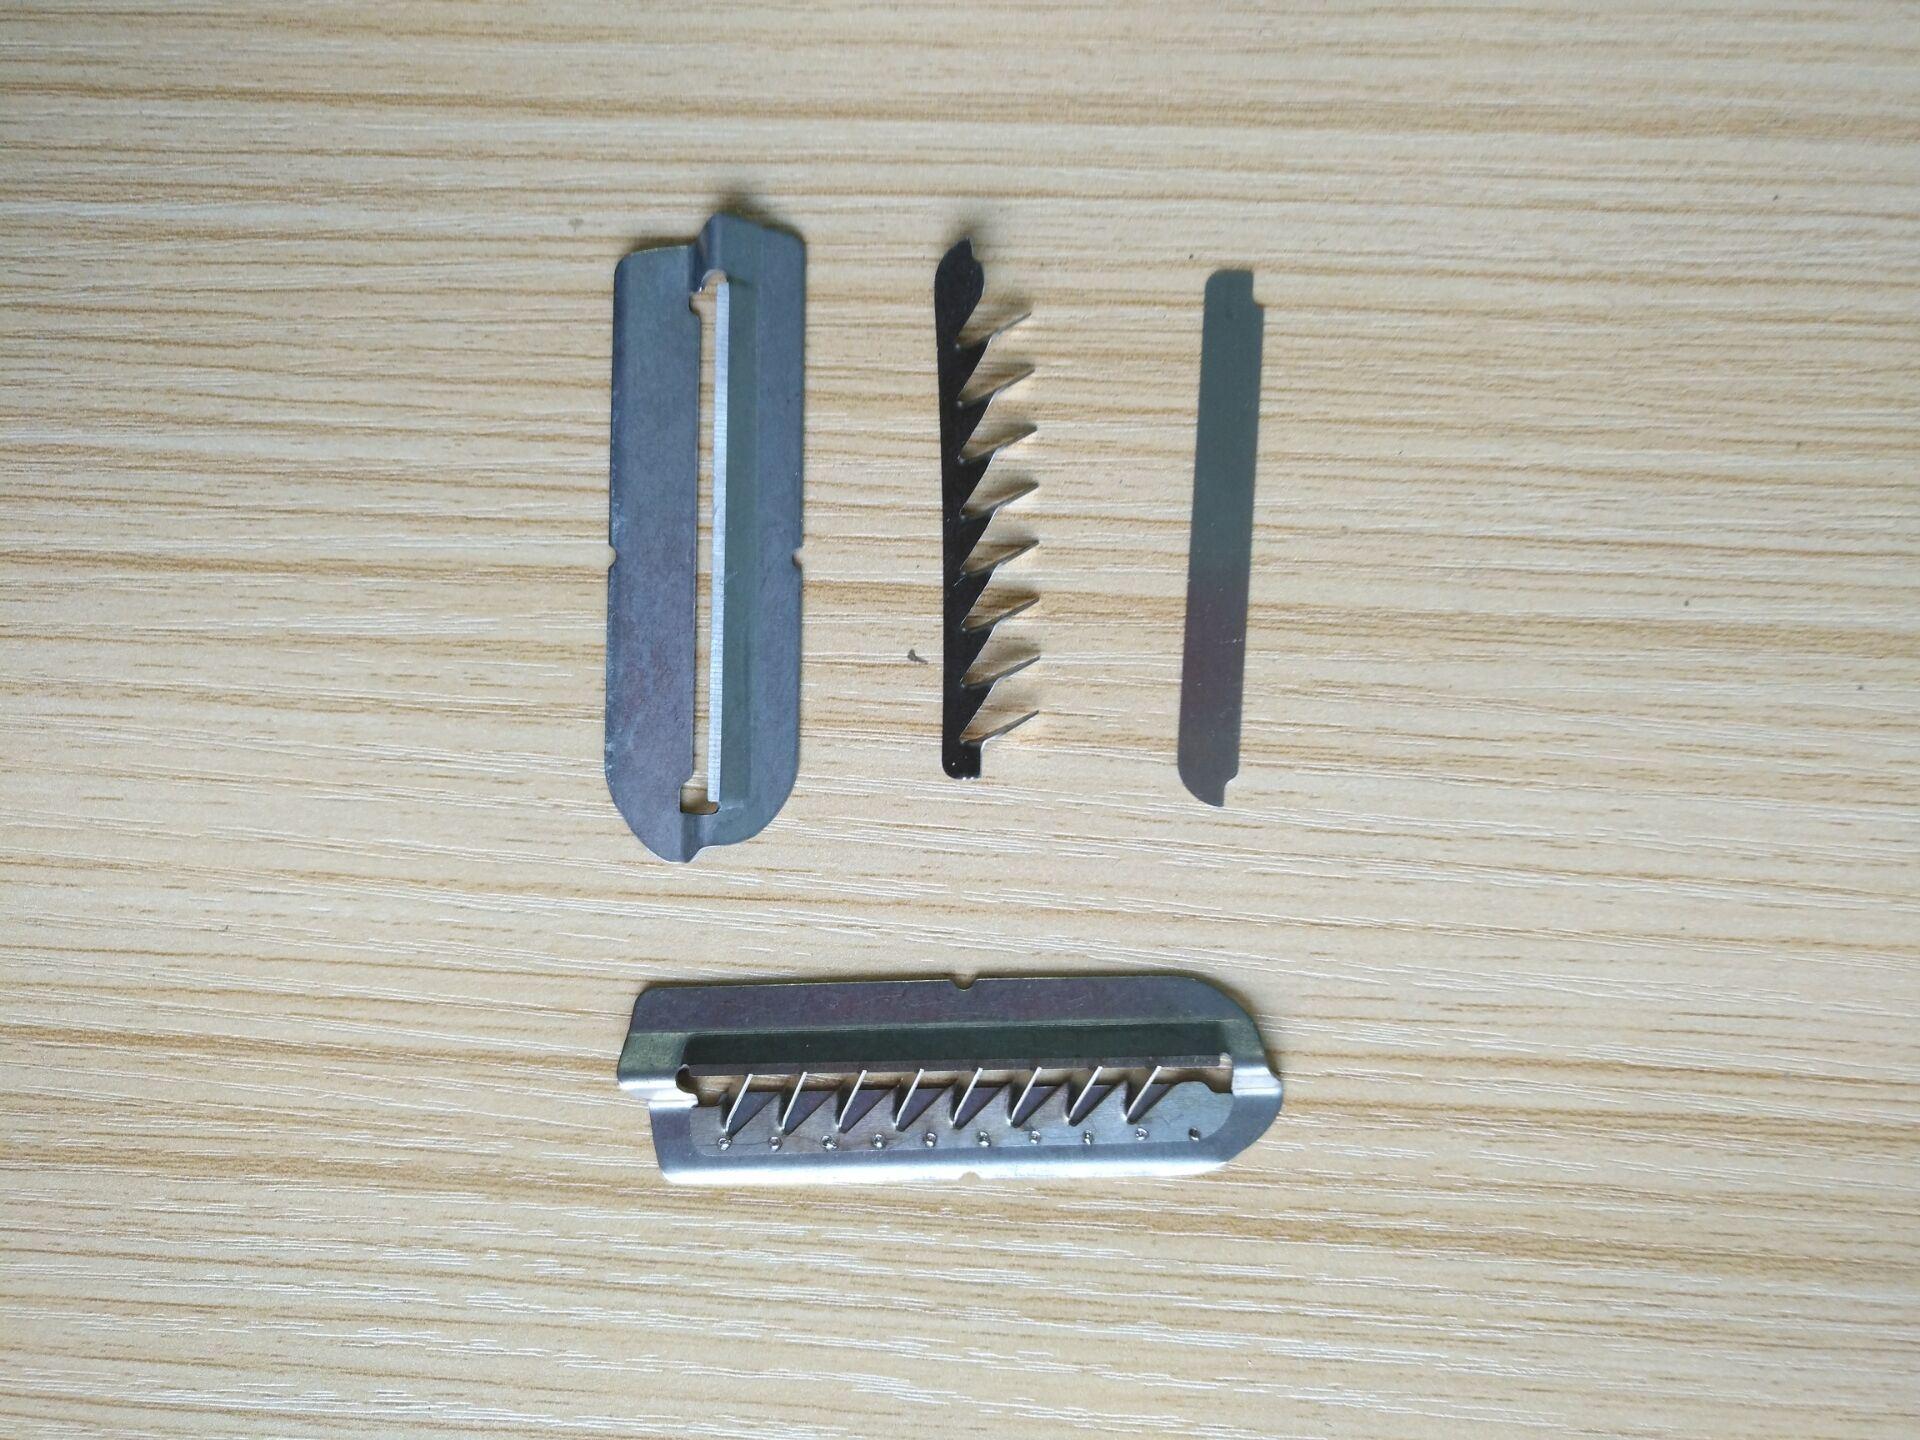 Fiber YAG Laser Mould Spot Welding Machine for Metal Repairing